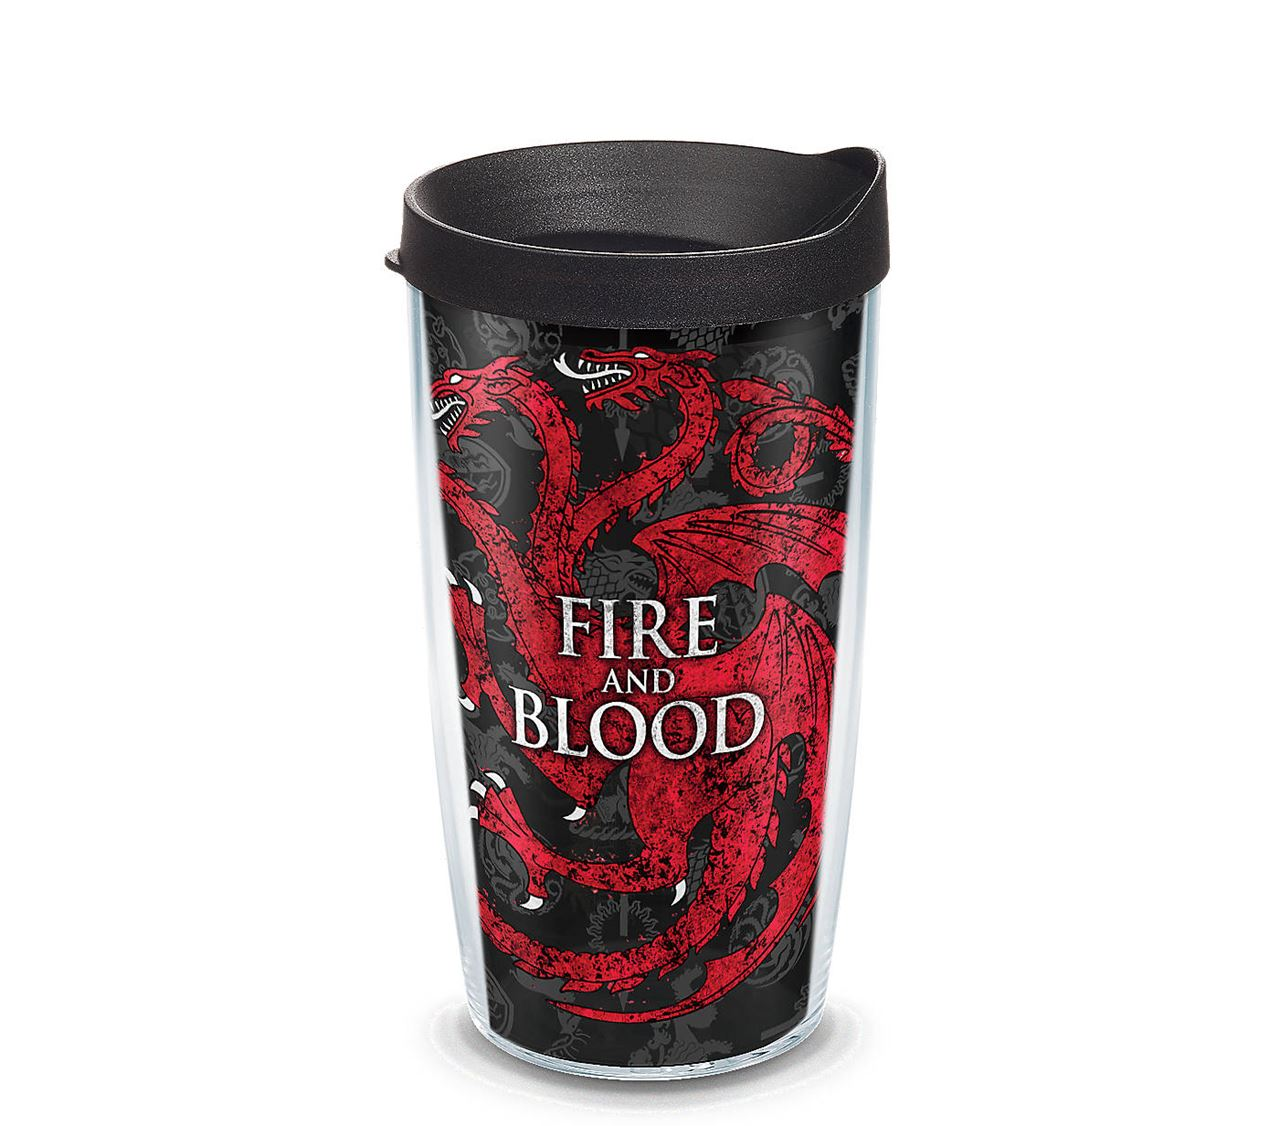 Game of Thrones 290 ml House of Targaryen Fire and Blood Glass Mug